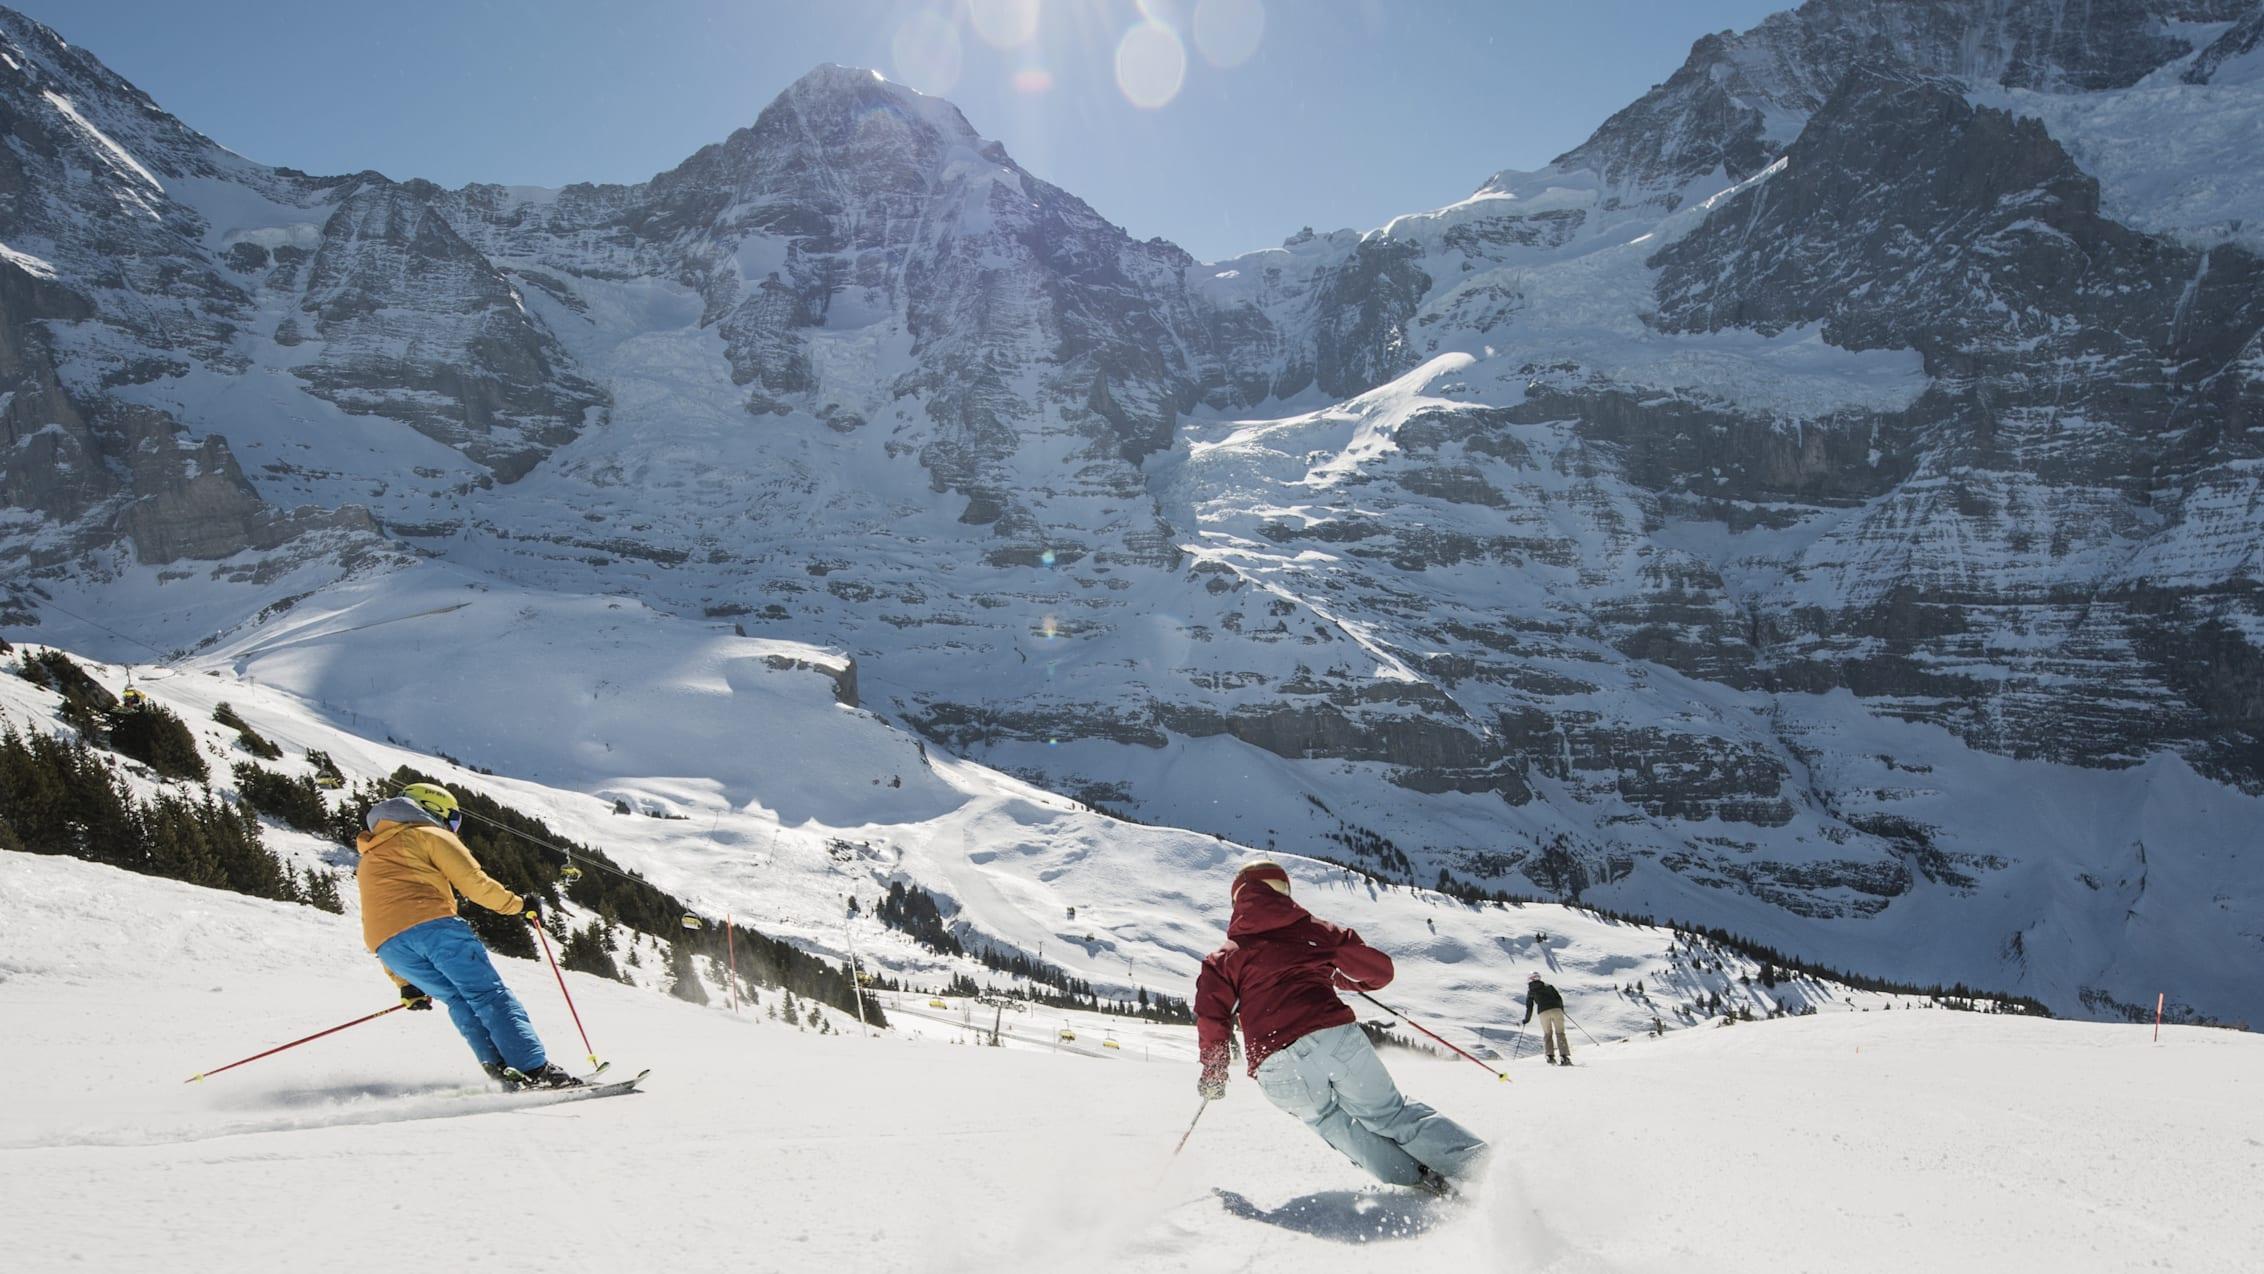 Skifahren Lauberhorn Eiger Moench Jungfraujoch